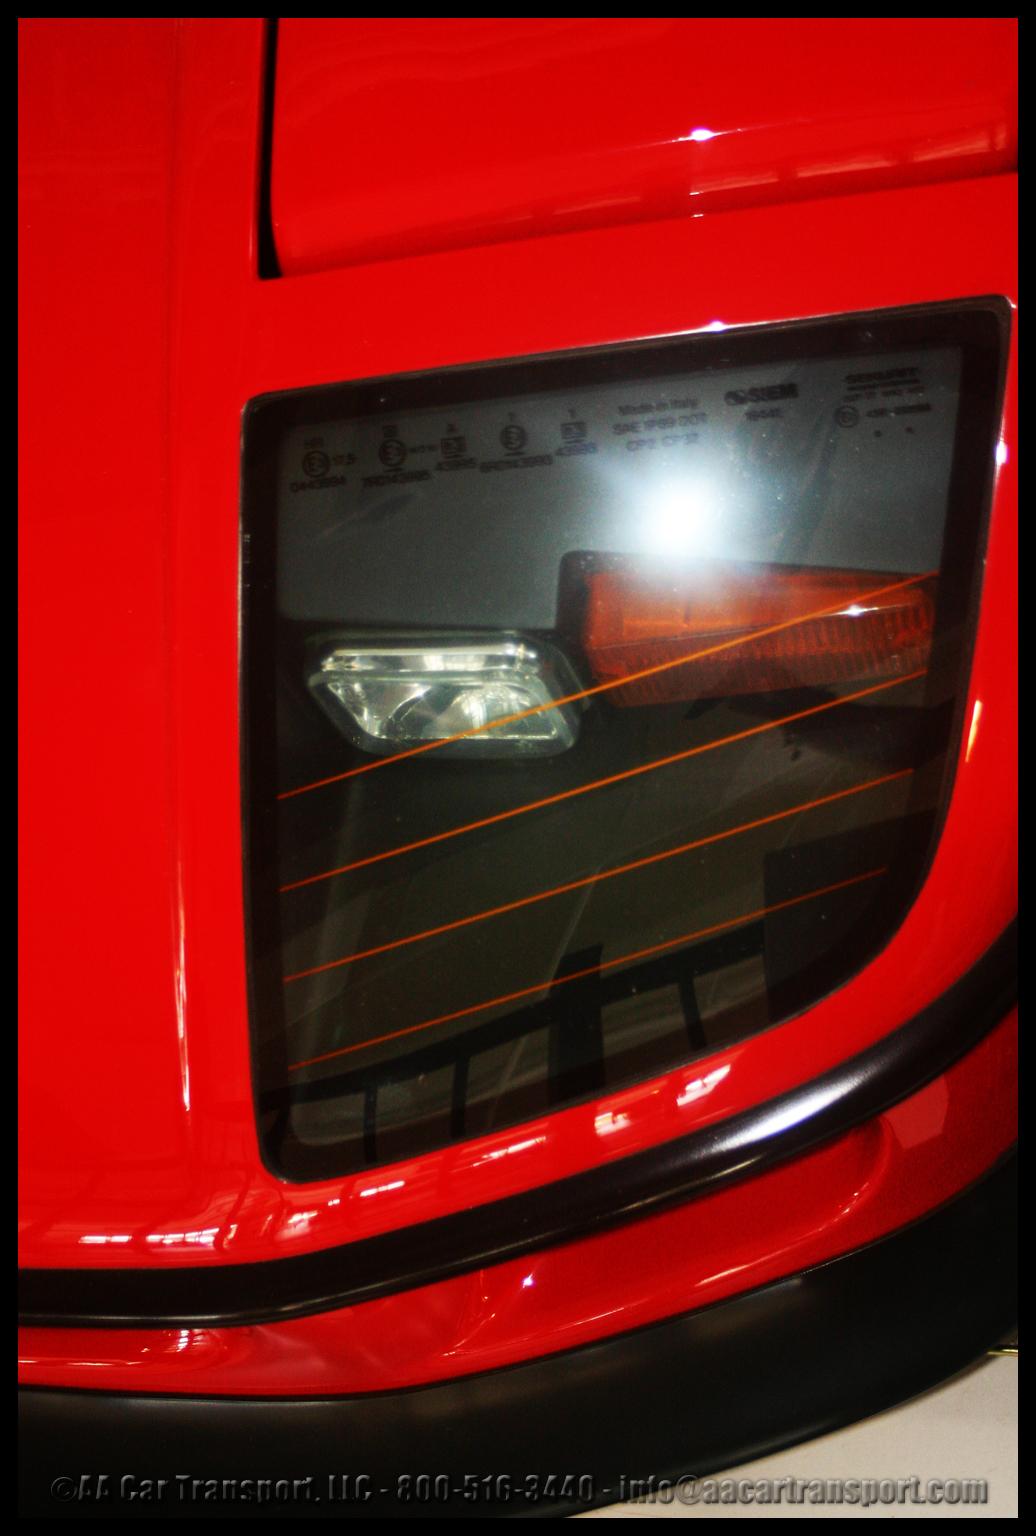 Ferrari Collecrtion Ferrari F40 1